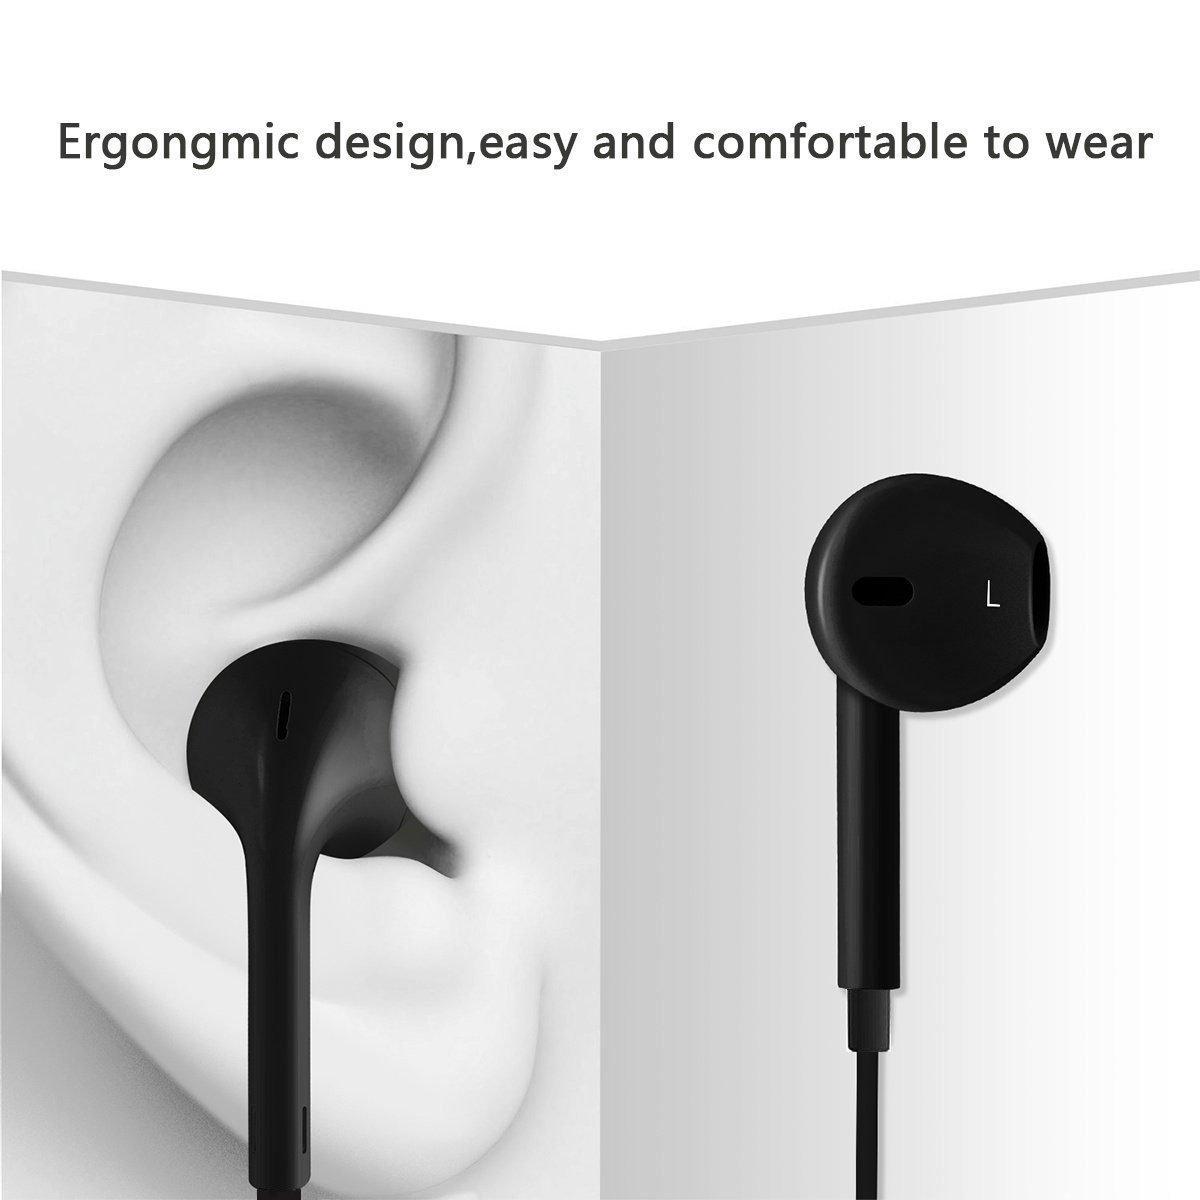 NCLINGLU, 2-Pack 3.5 mm Premium Earphones Headphone, [Stereo Mic Remote Control], Compatible iPhone iPad iPod Samsung Galaxy [Black]